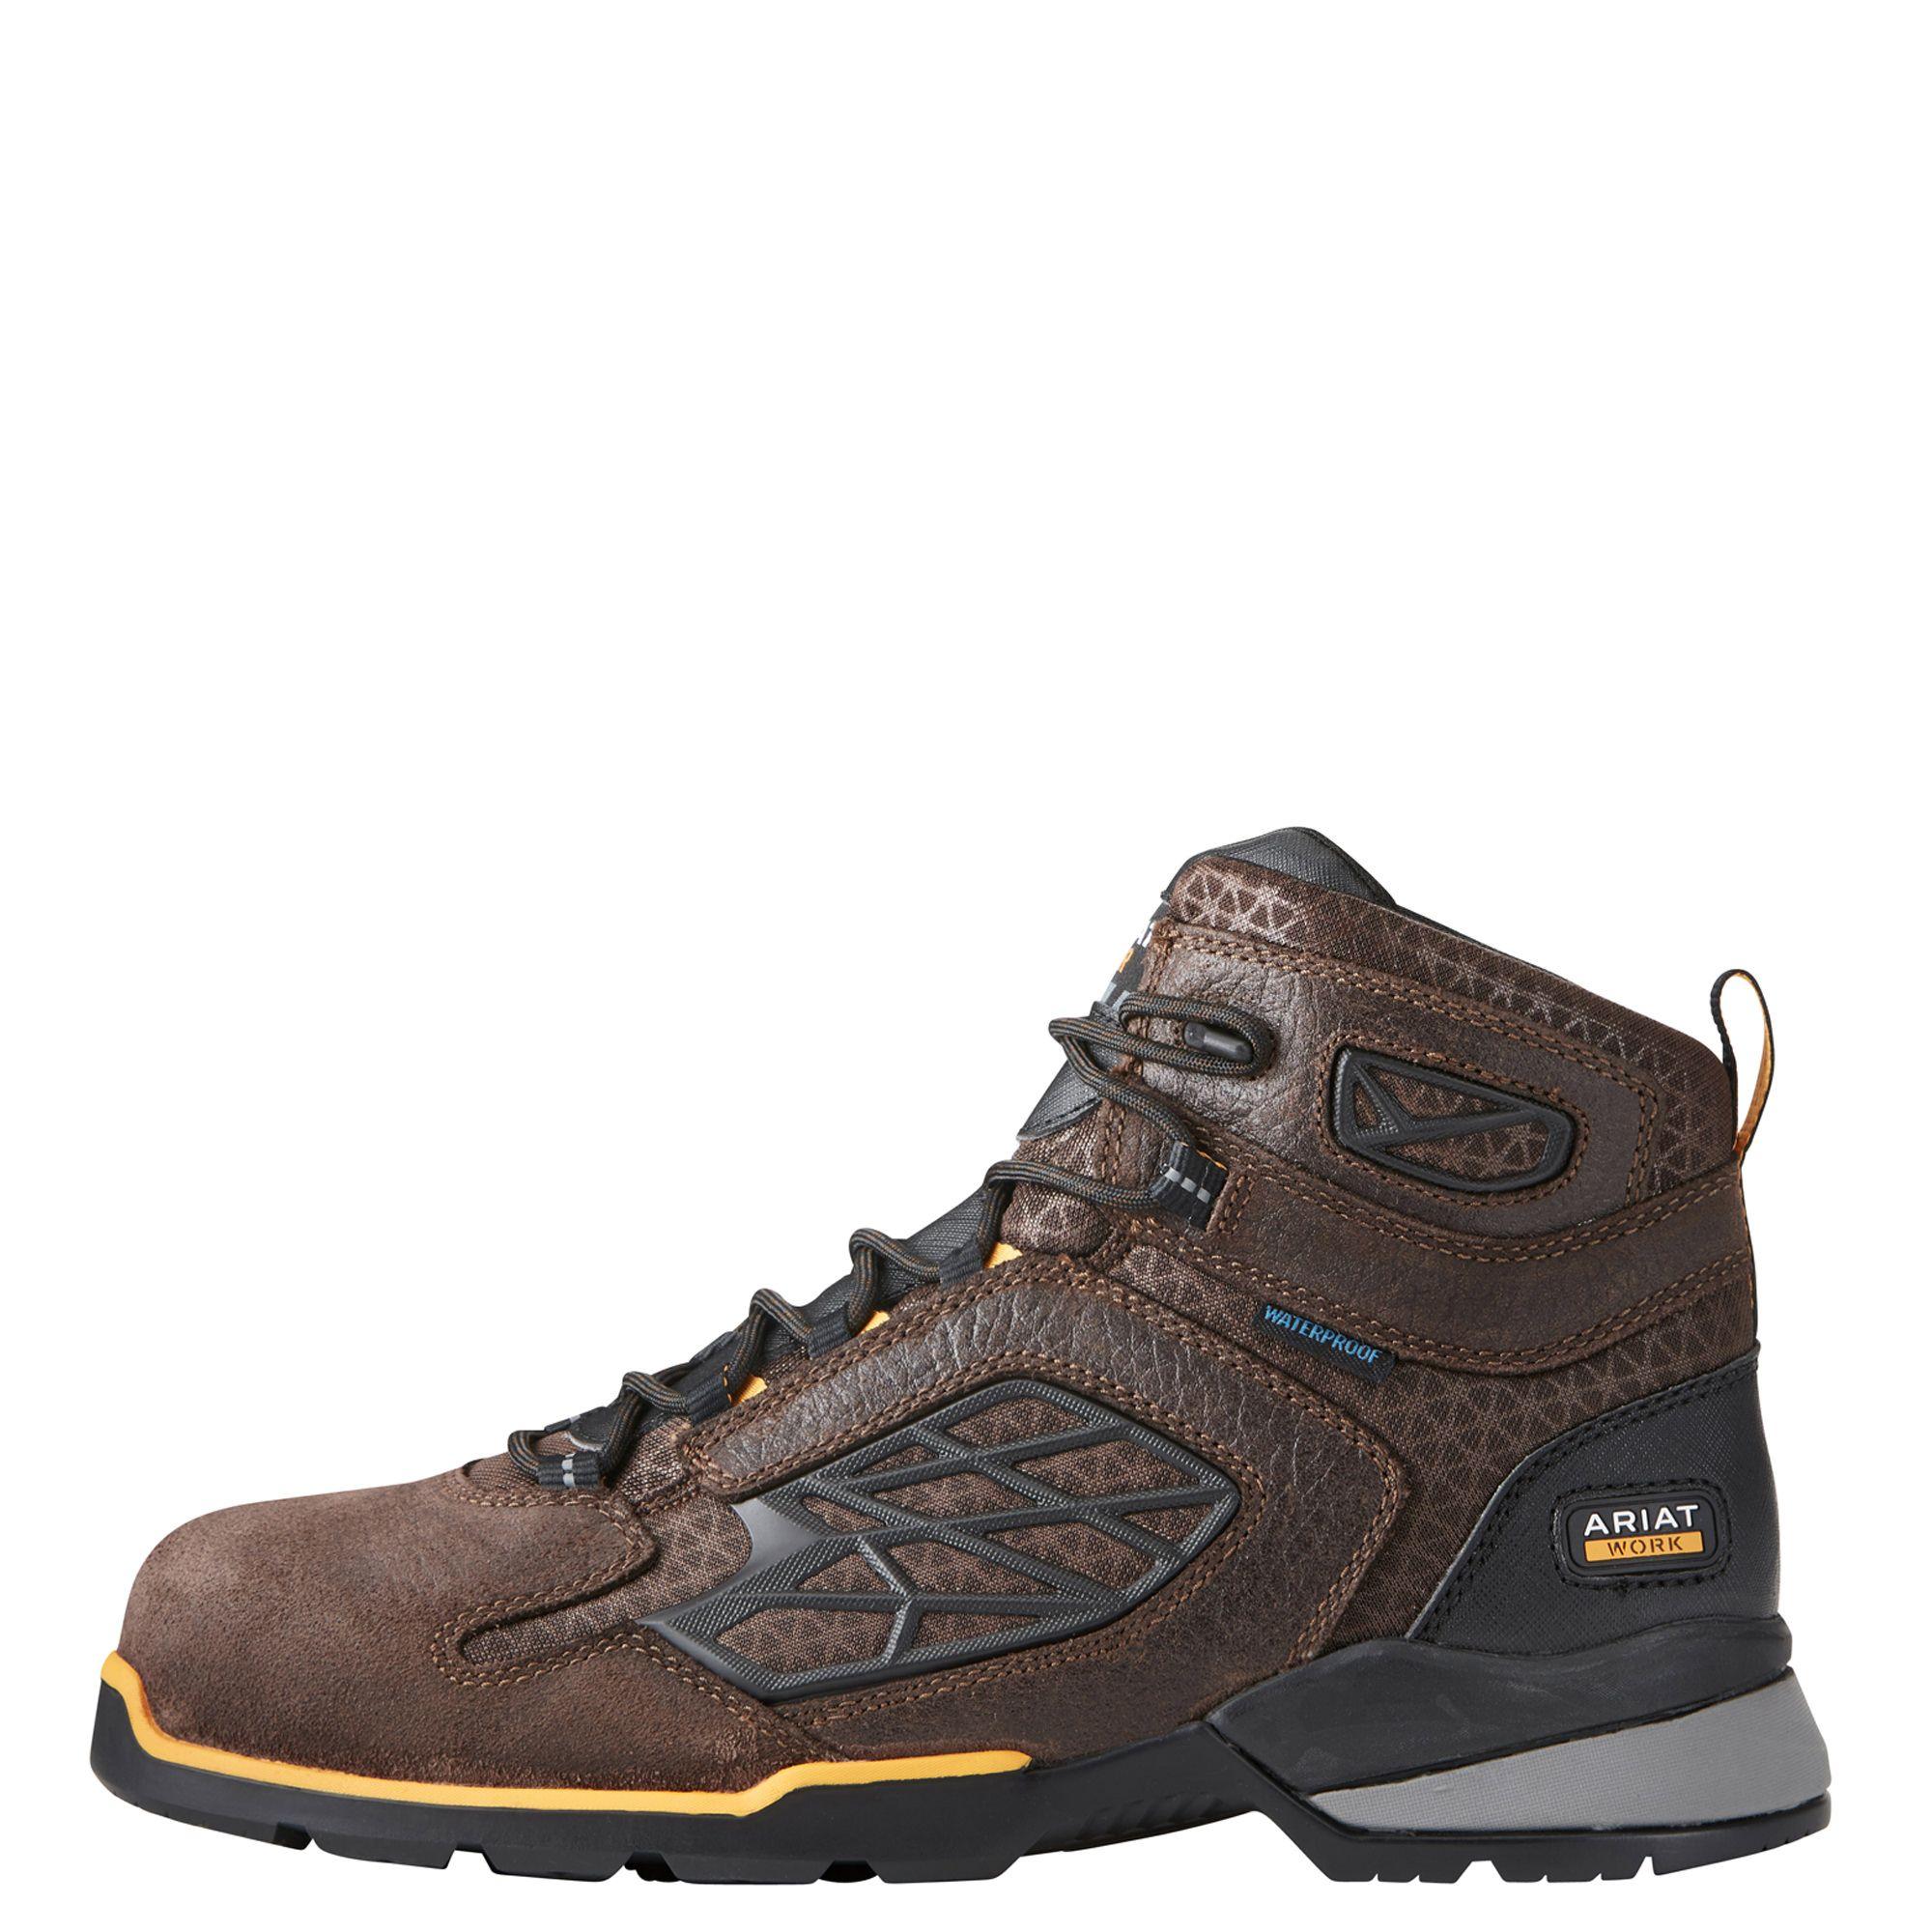 Rebar Flex 6 Waterproof Composite Toe Work Boot Composite Toe Work Boots Boots Dark Brown Leather